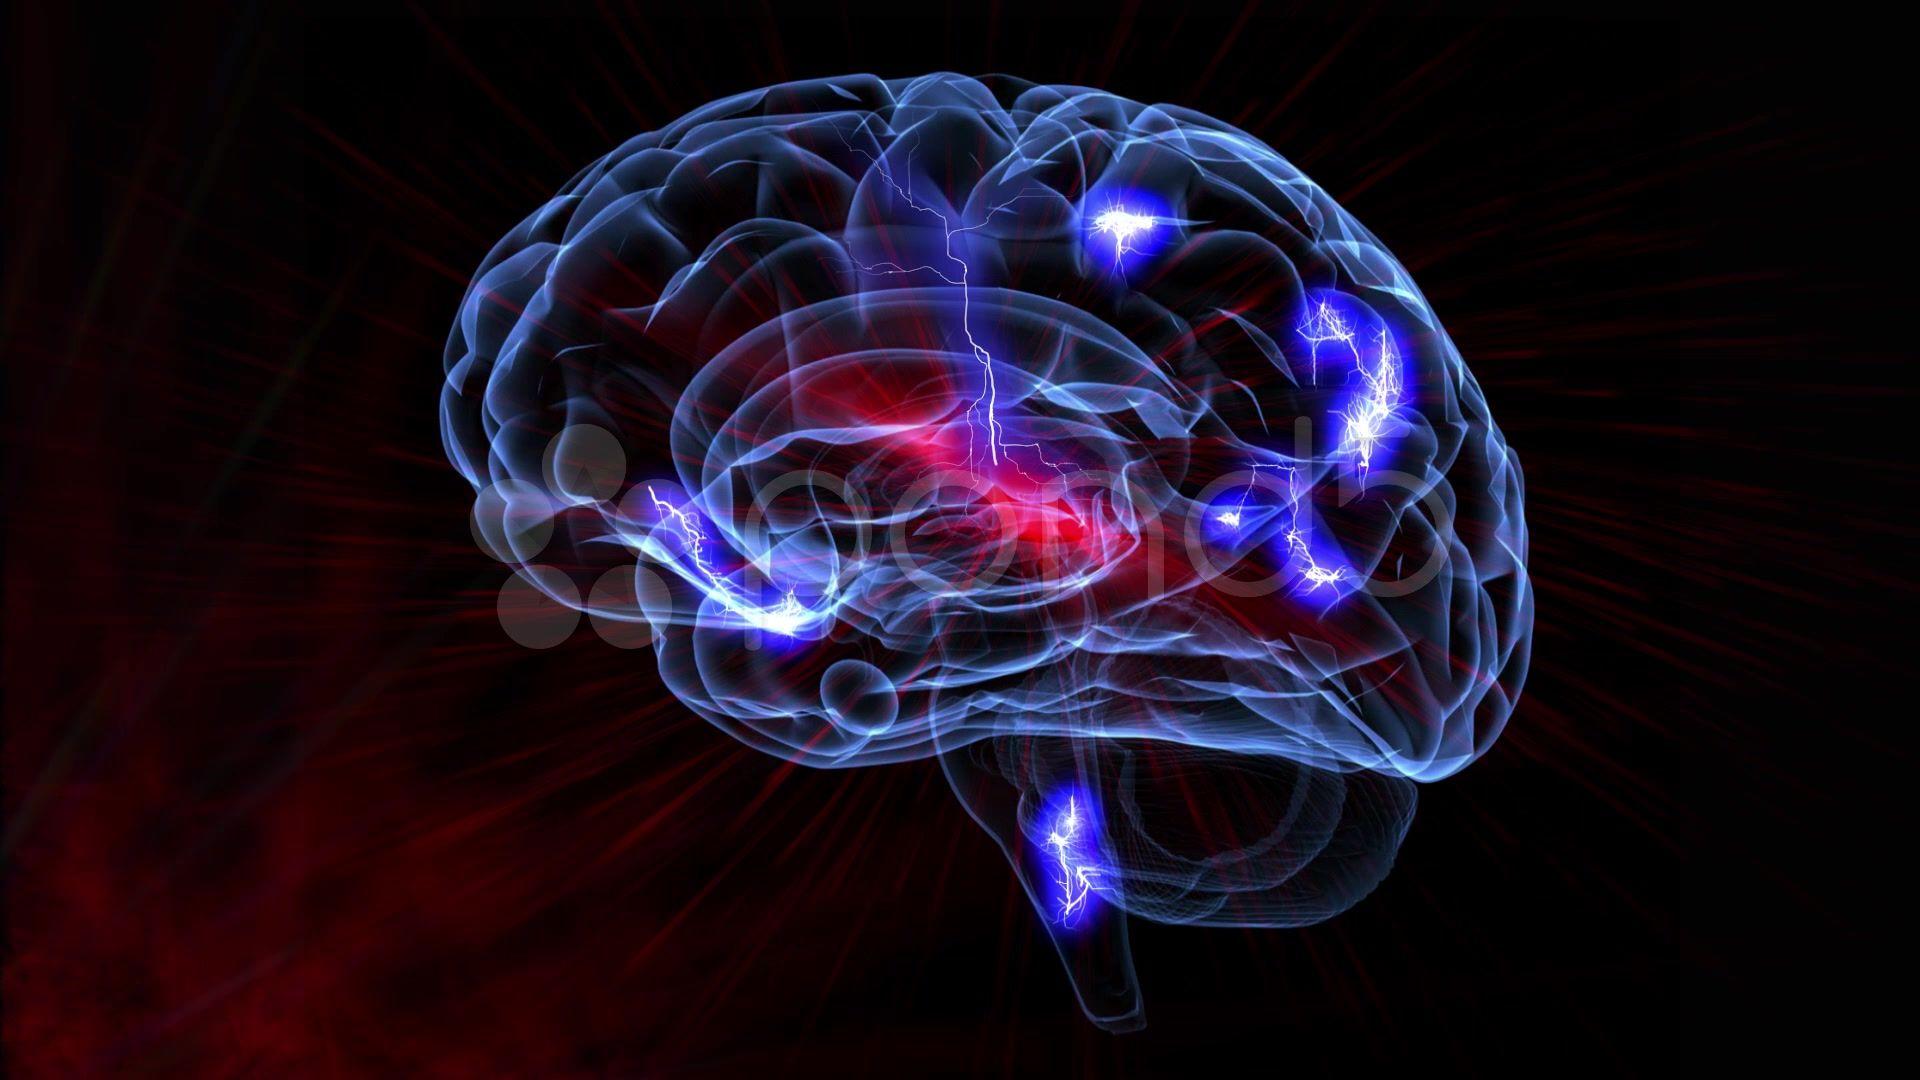 Brain download free wallpaper image search